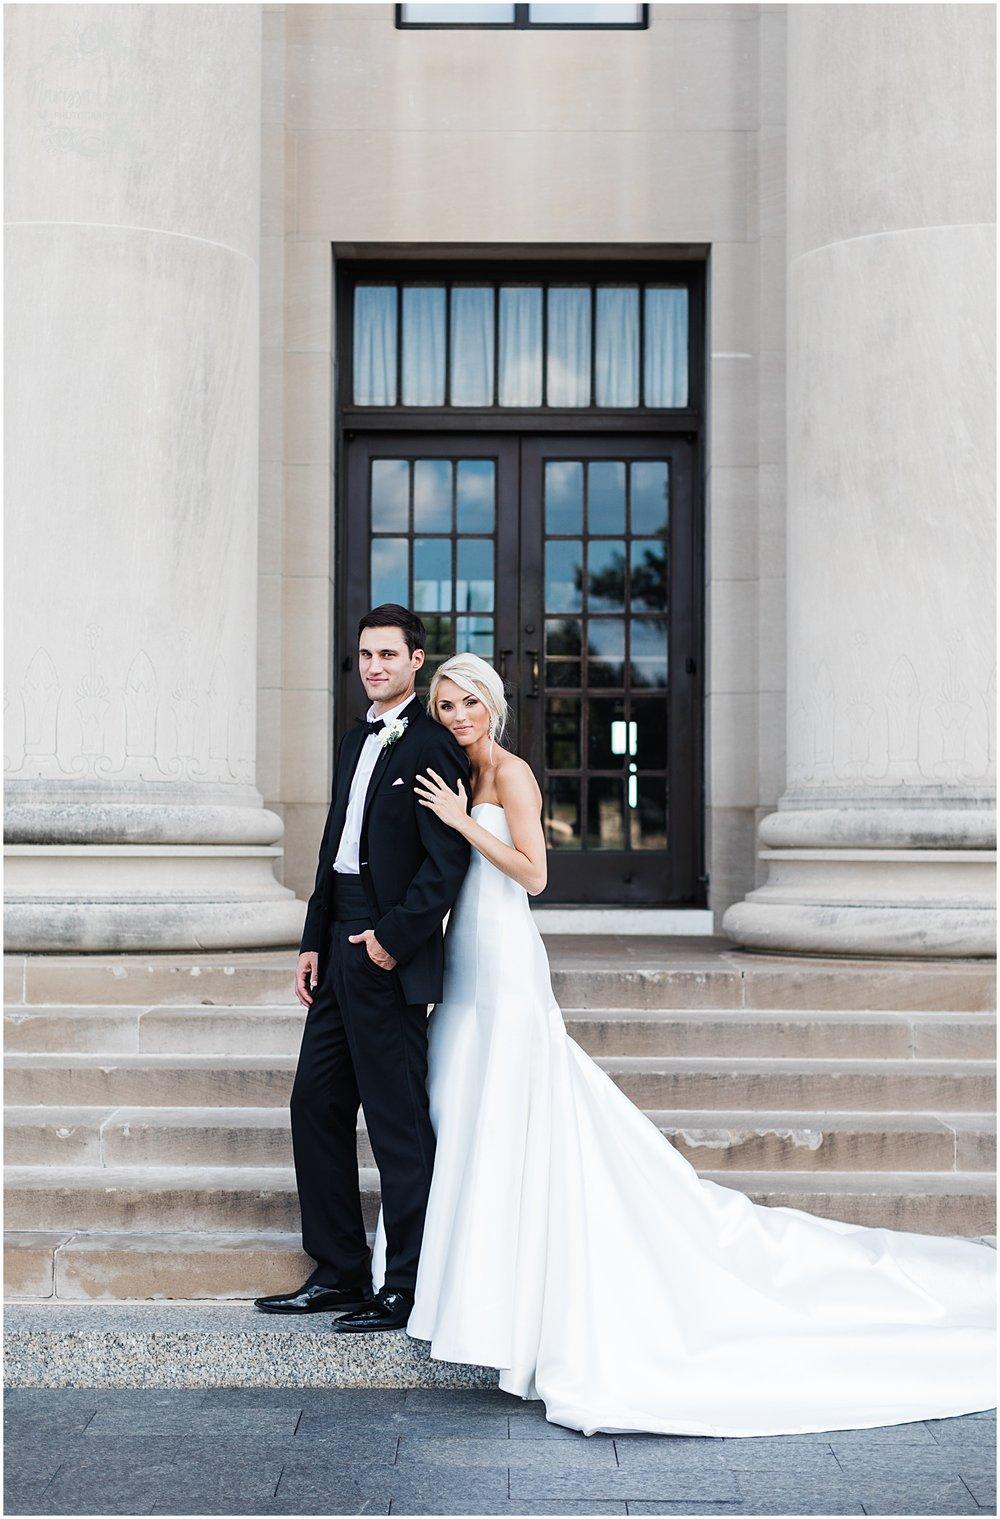 NOLL WEDDING | THE BRASS ON BALTIMORE | MARISSA CRIBBS PHOTOGRAPHY_6335.jpg